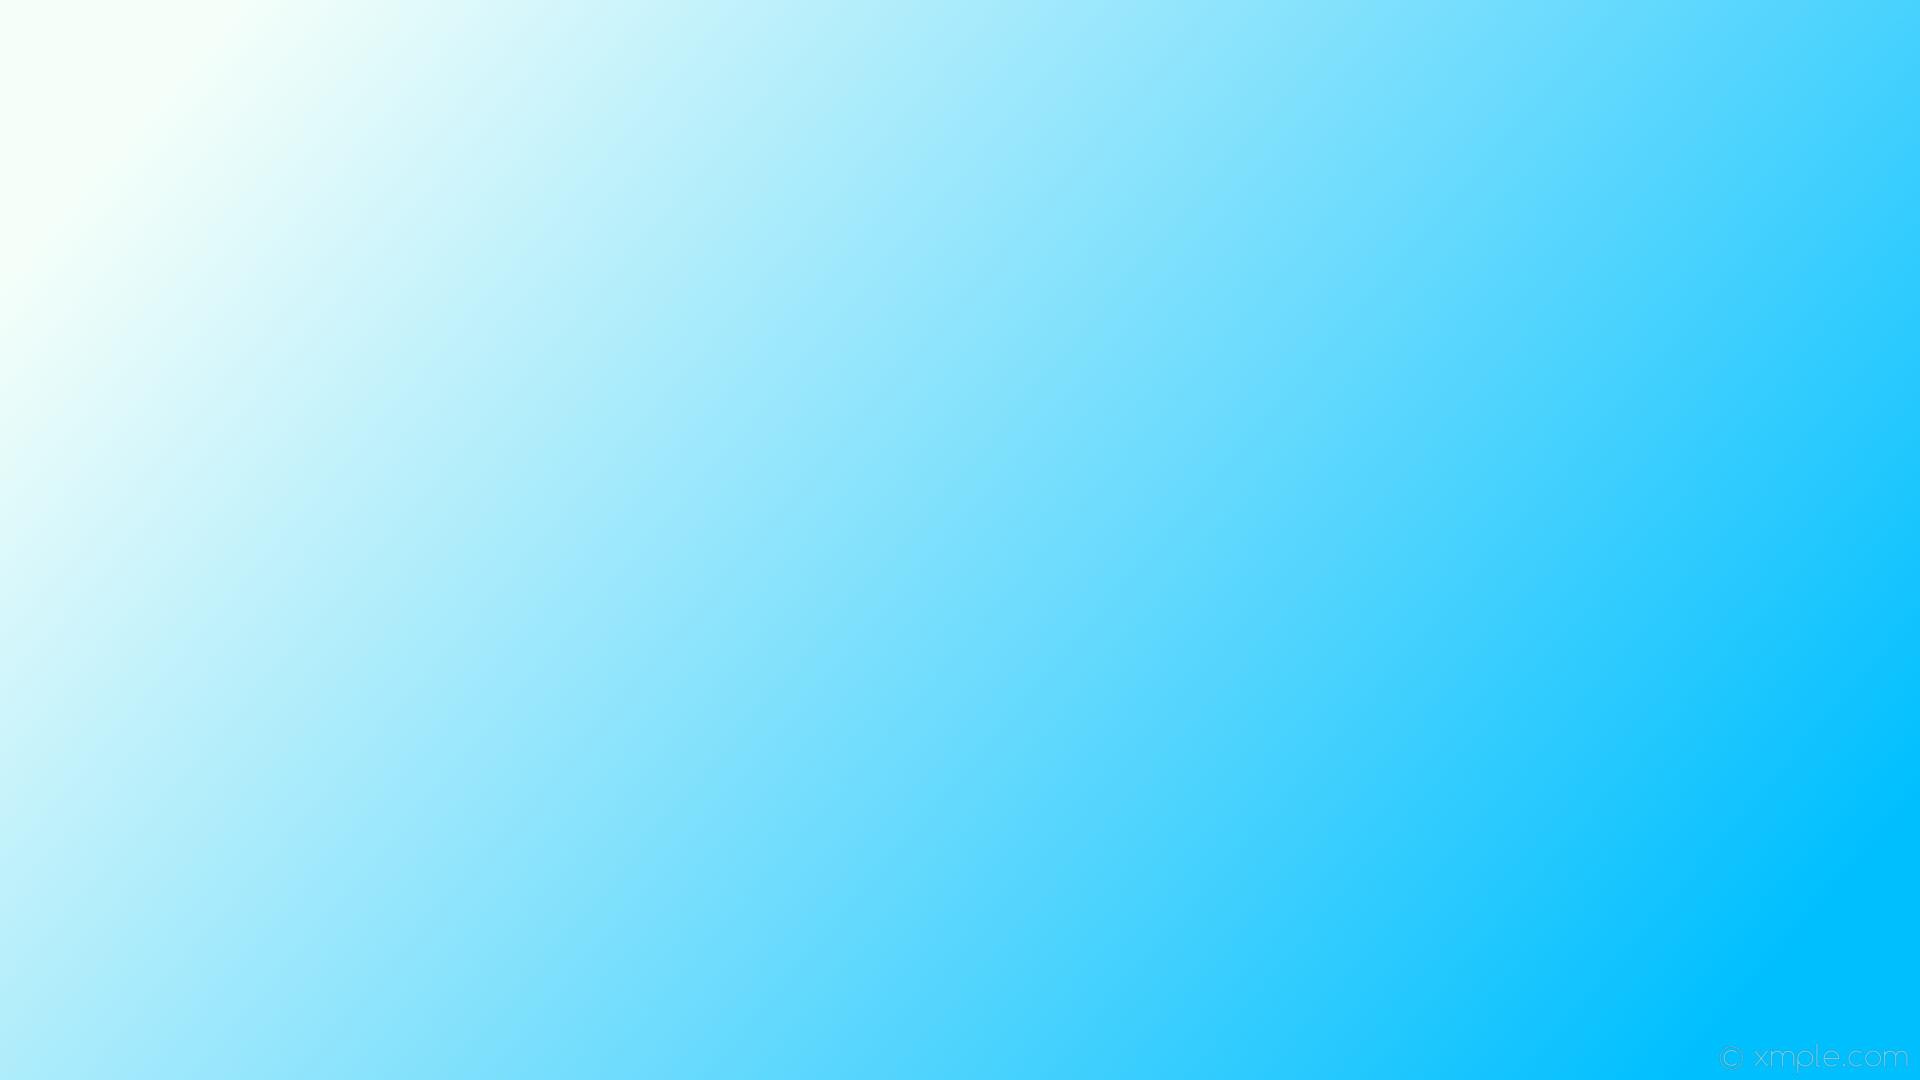 wallpaper linear gradient blue white mint cream deep sky blue #f5fffa  #00bfff 165°